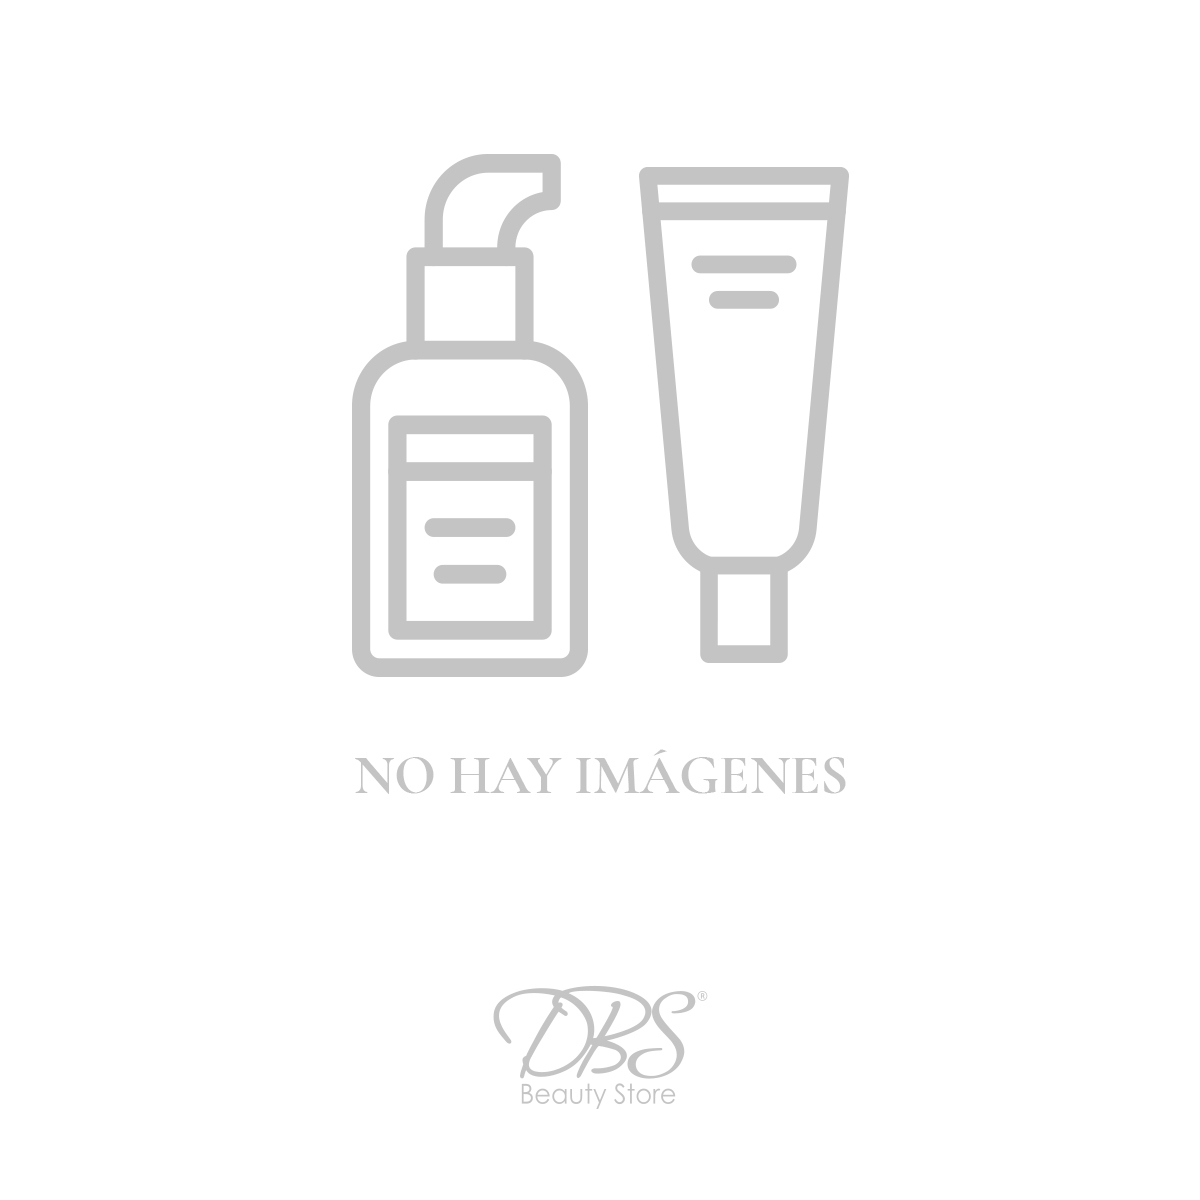 Pestañas Magnéticas Naked 422